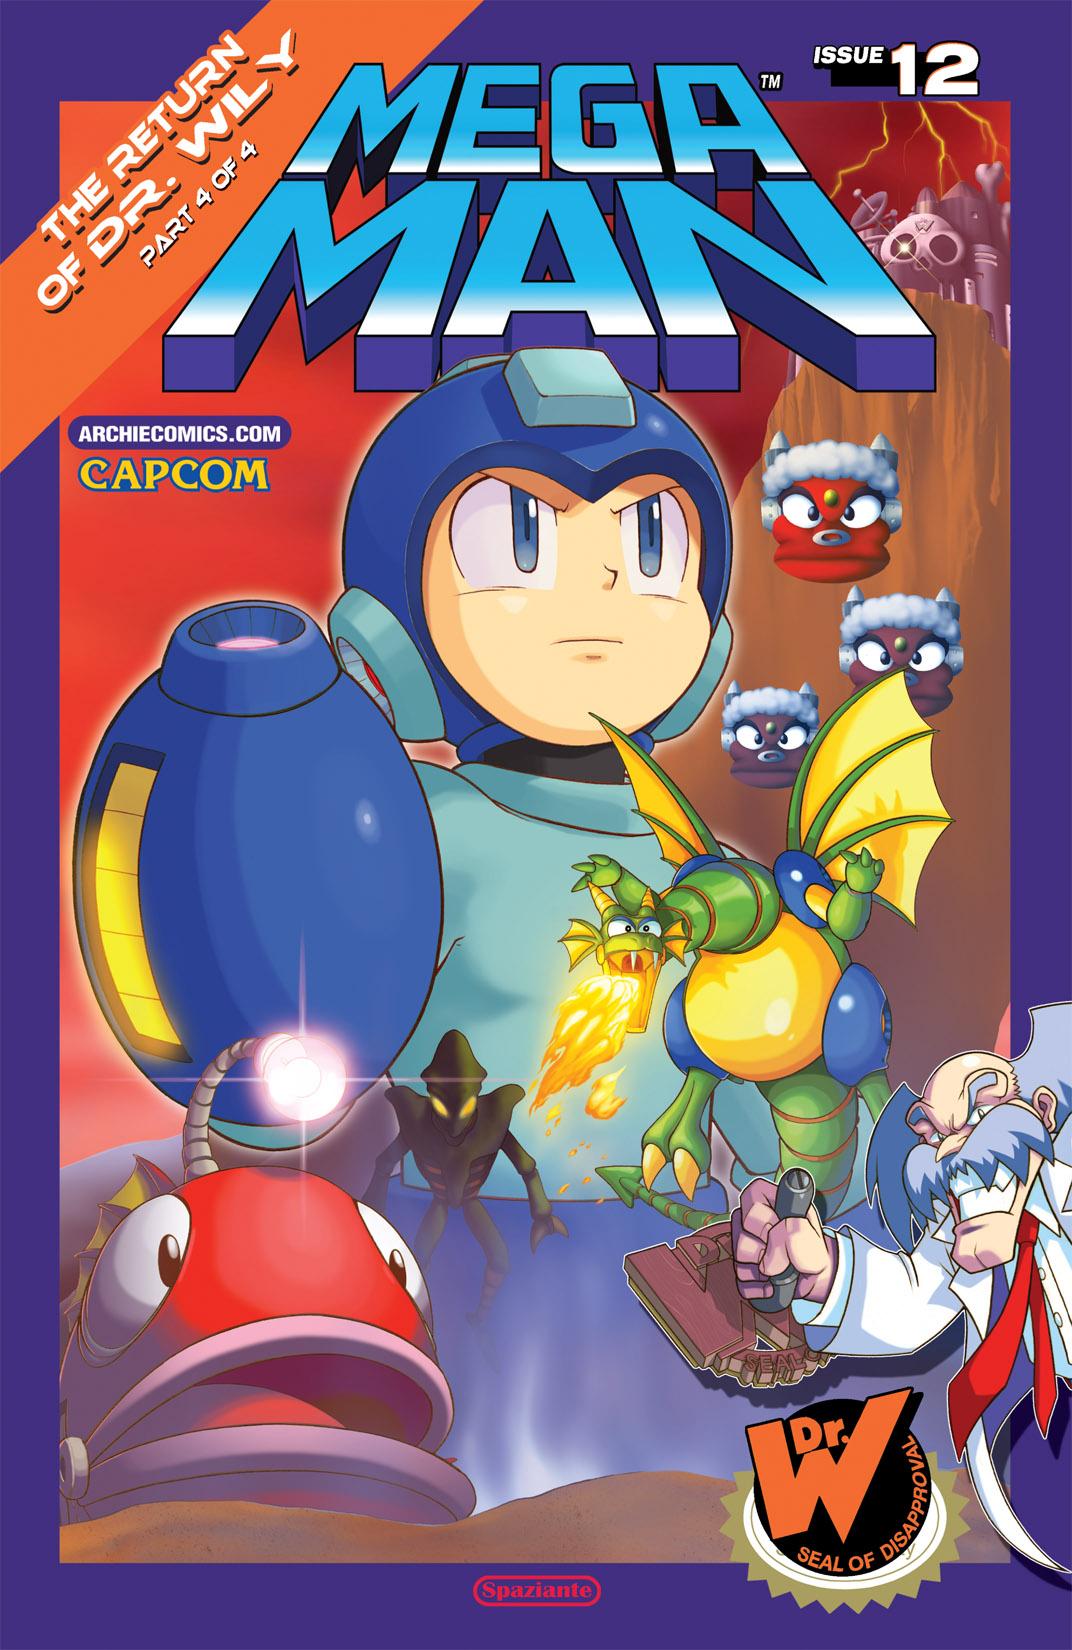 Mega man issue 12 archie comics mmkb fandom powered for Megaman 9 portada